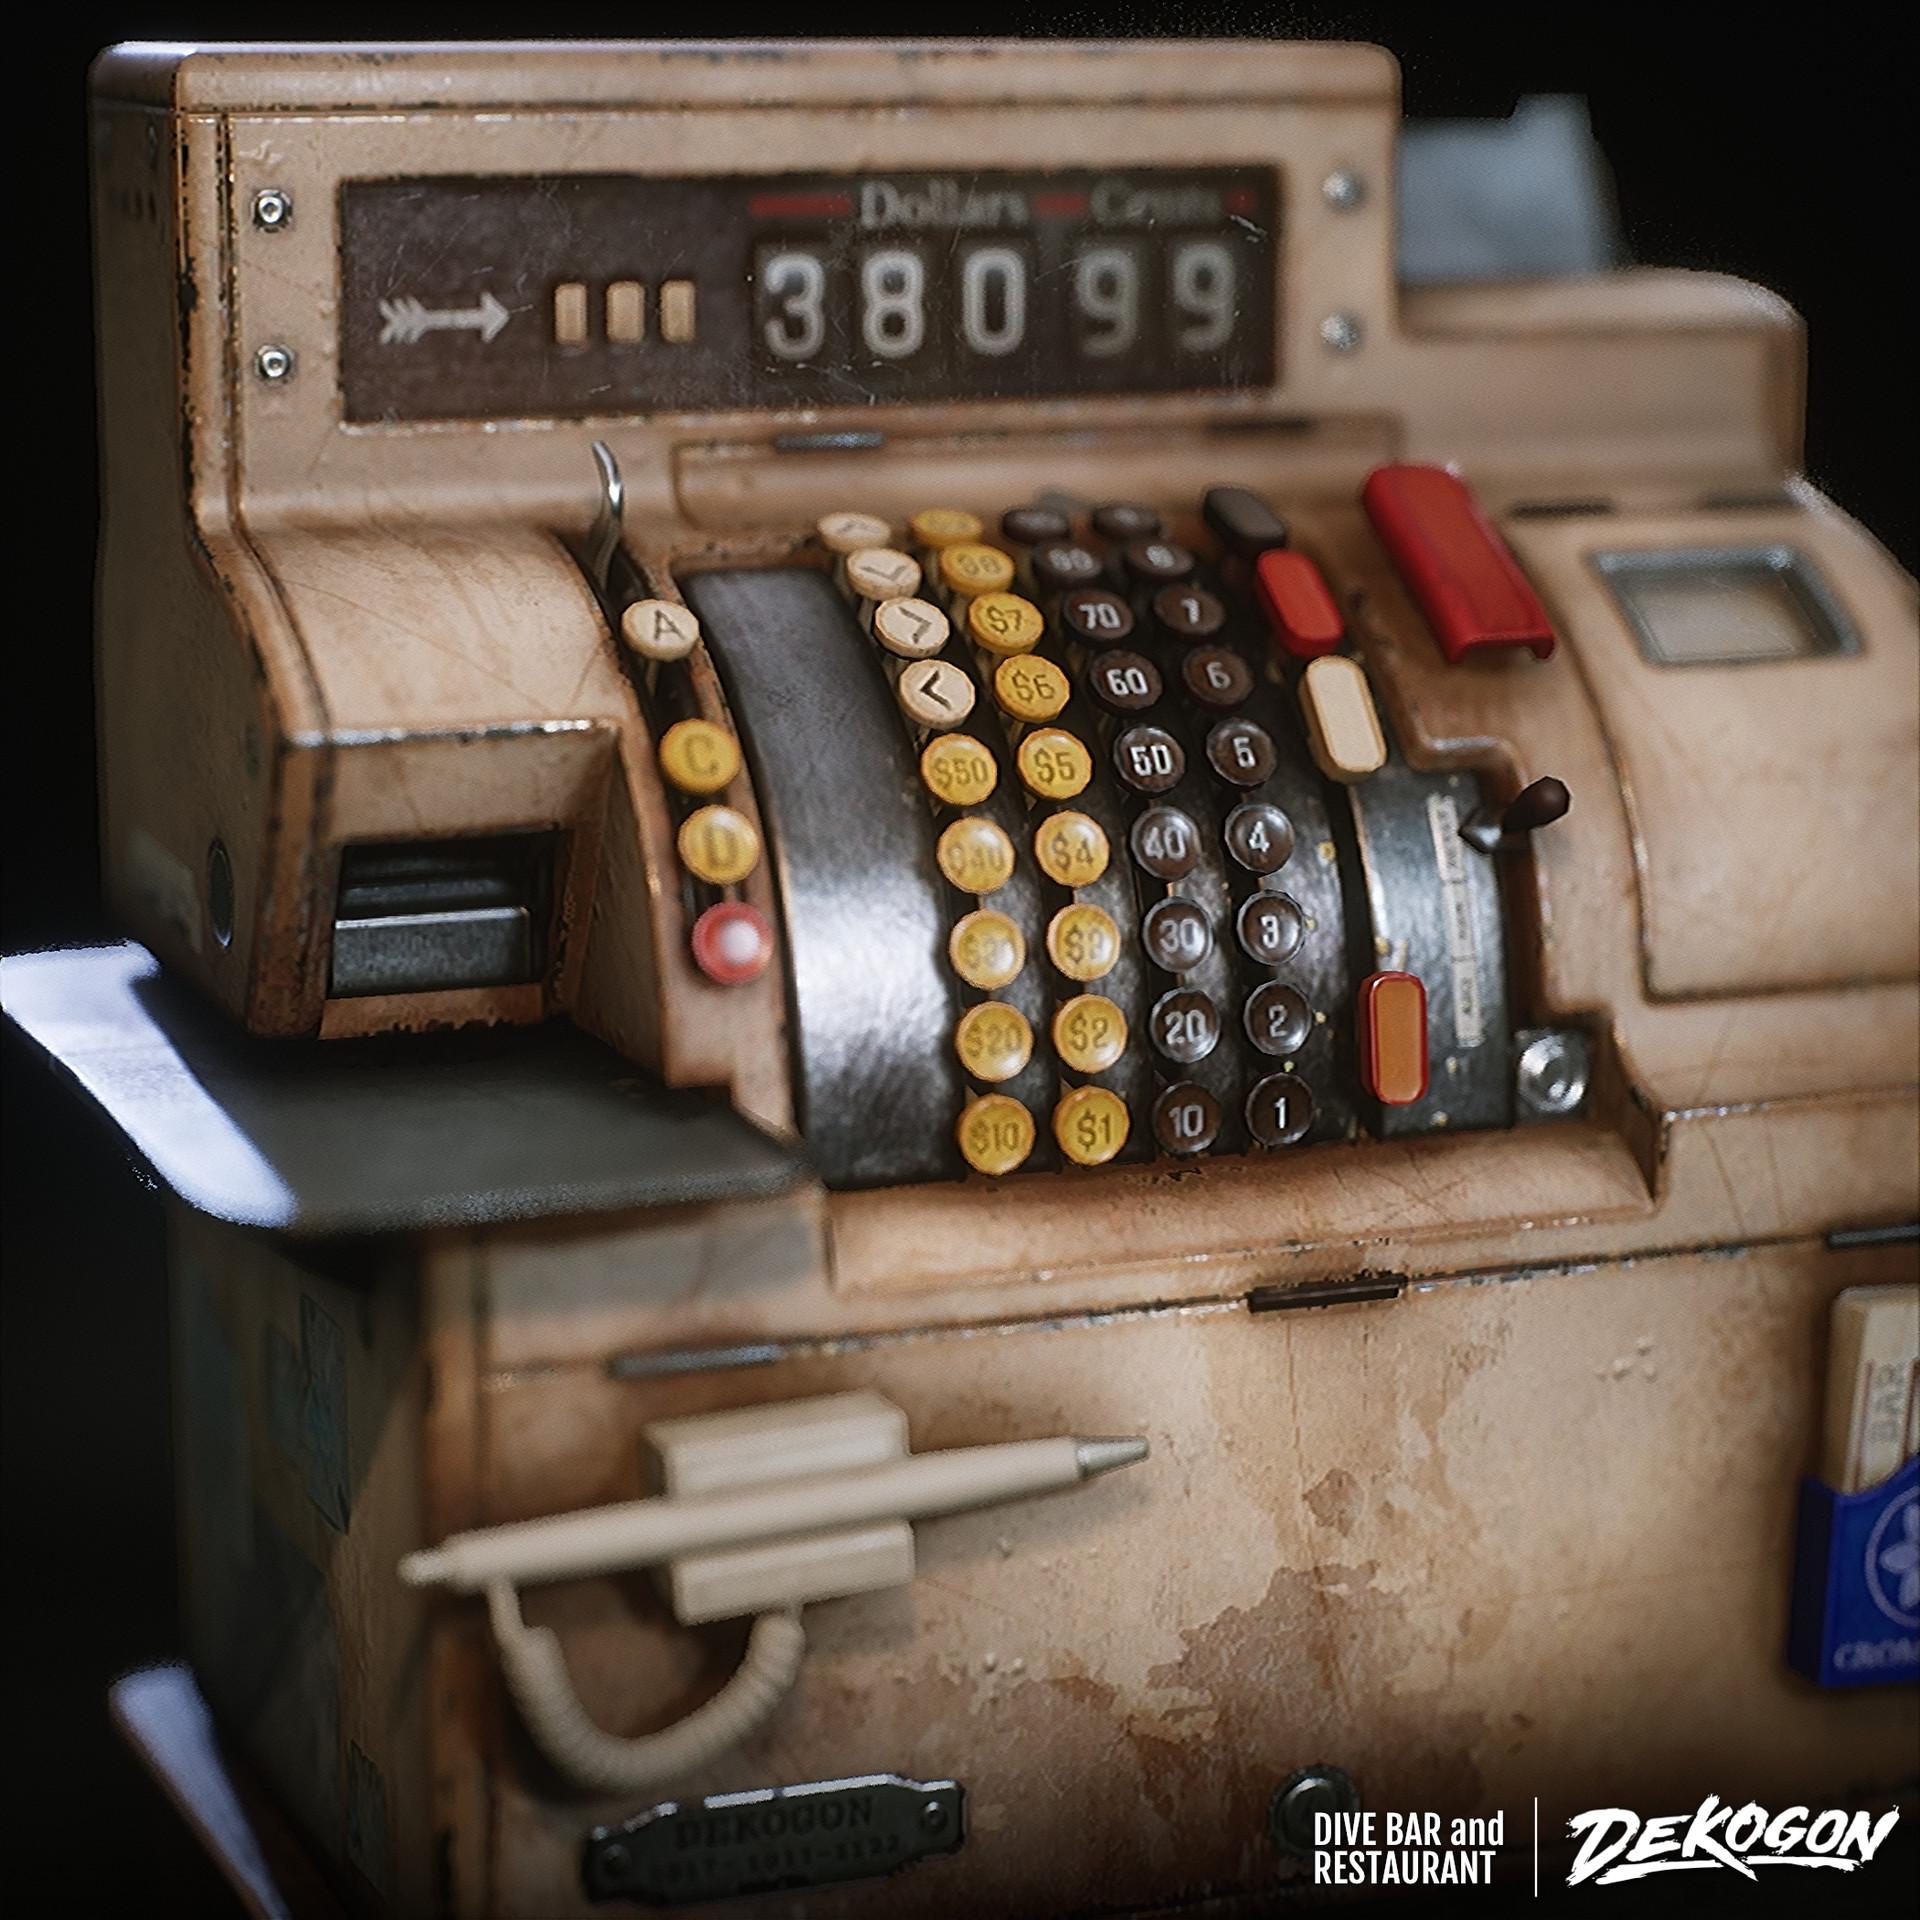 Wahyu nugraha cashregister 01 11